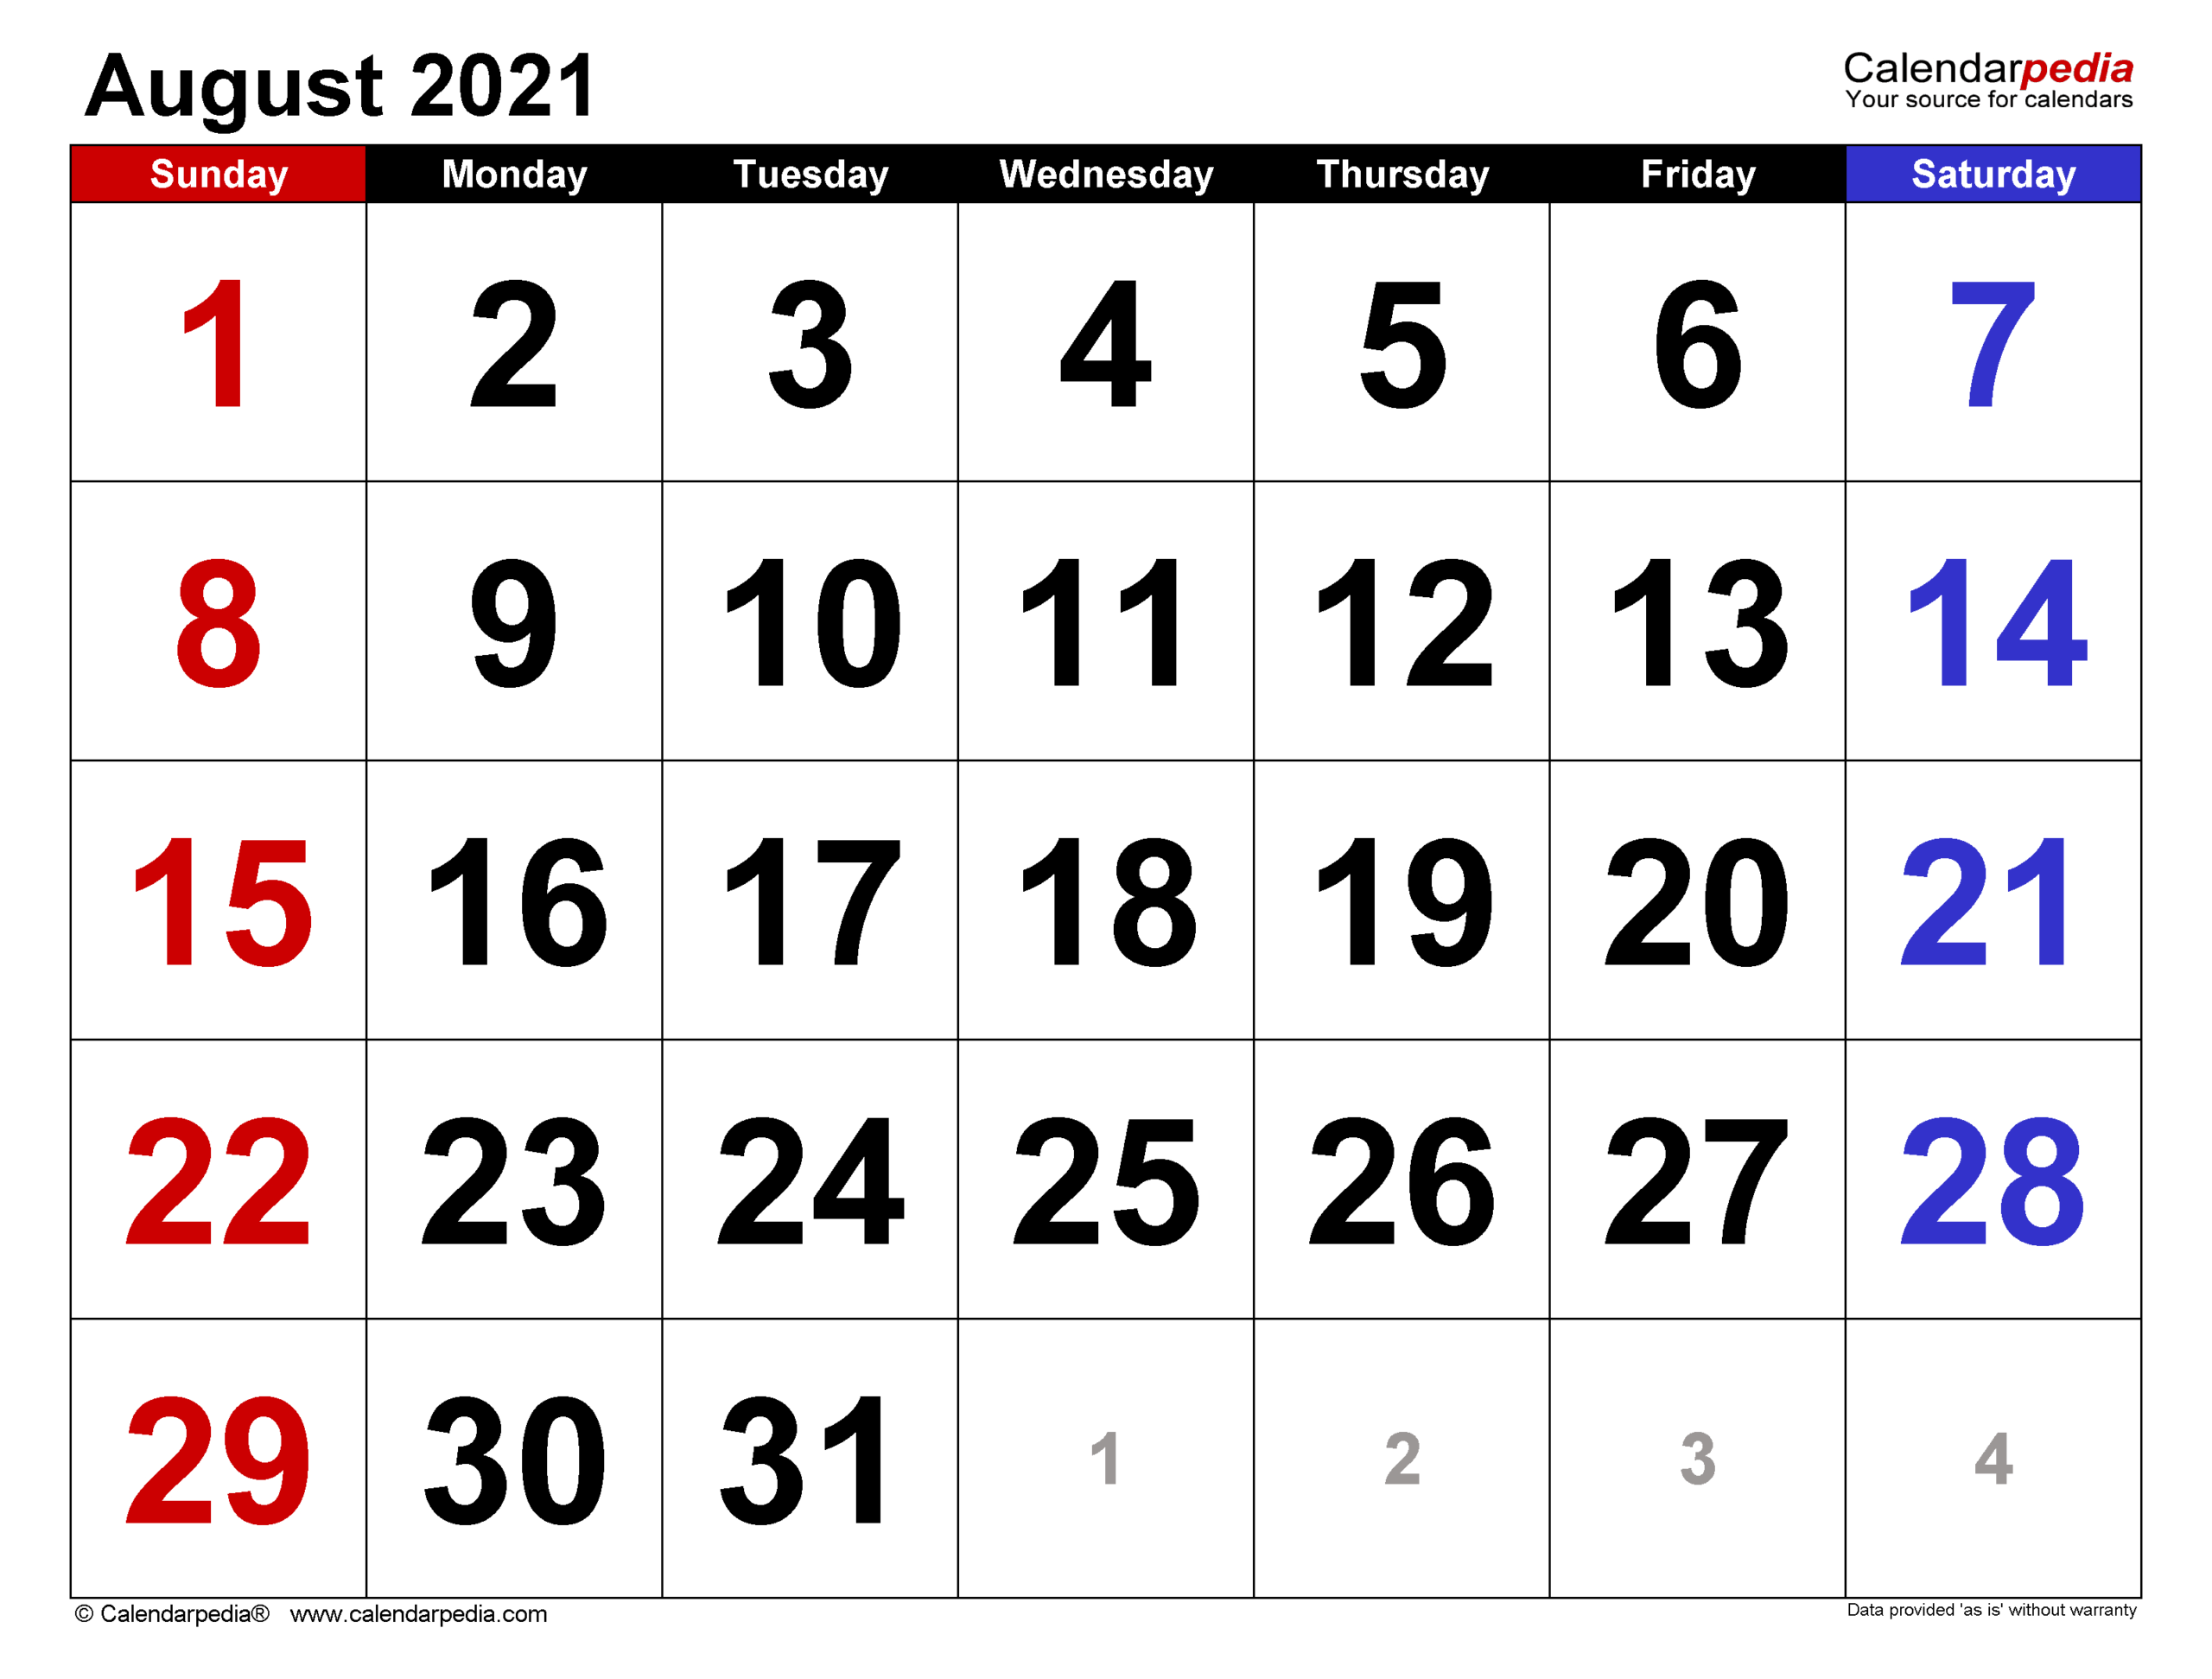 August 2021 Calendar With Holidays